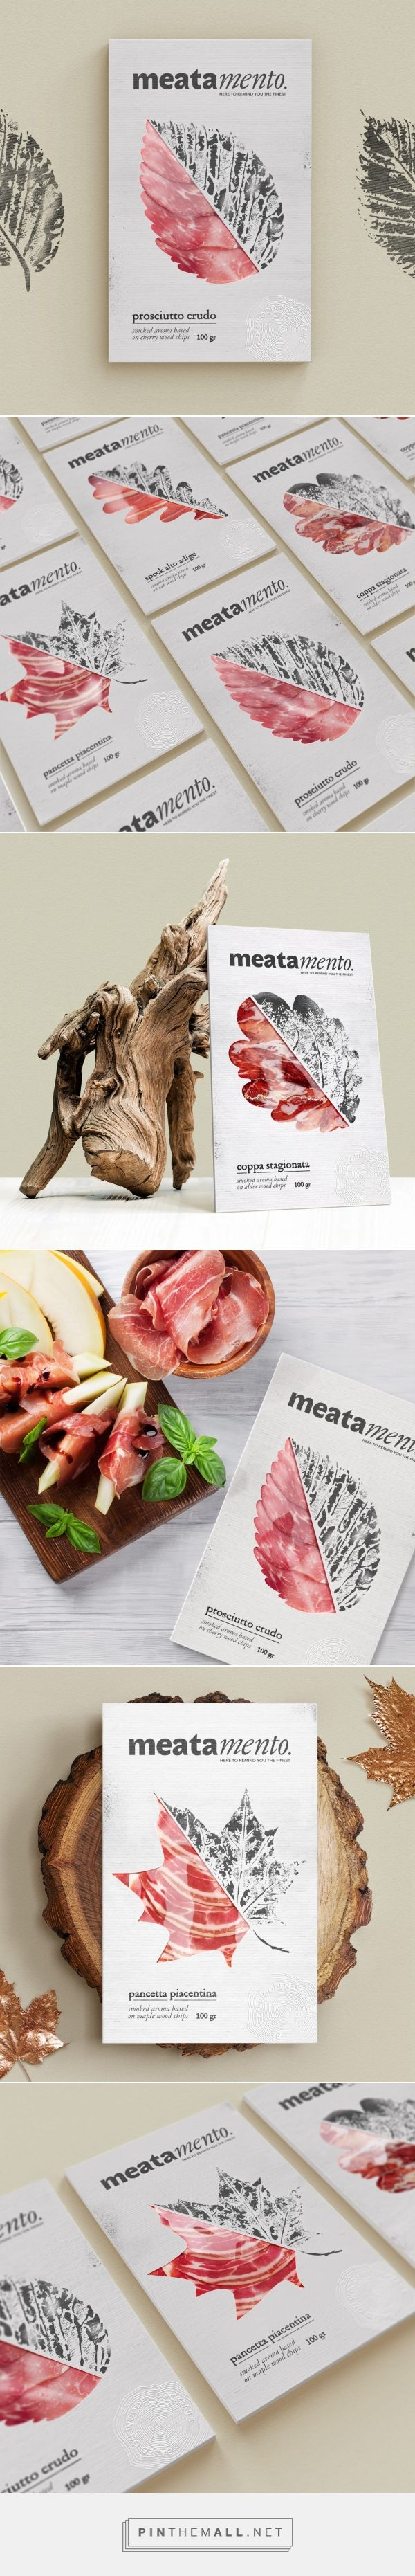 Meatamento packaging design by Gordost - https://www.packagingoftheworld.com/2018/03/meatamento.html